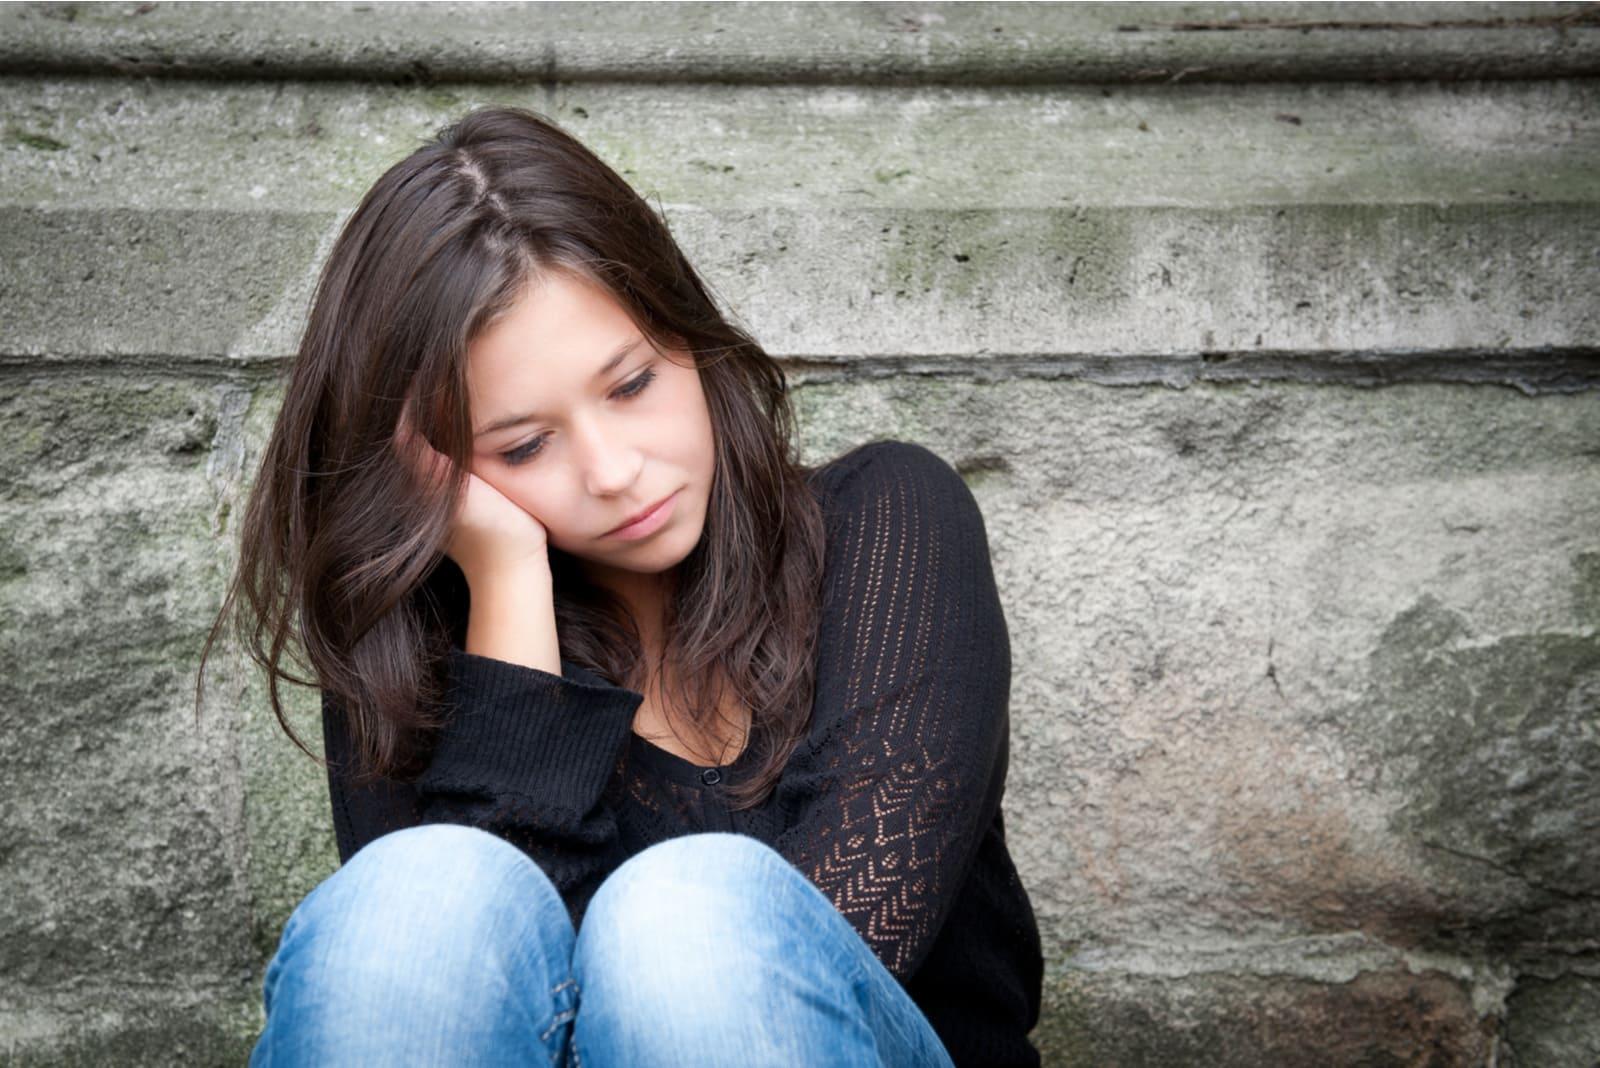 sad woman sitting outdoor